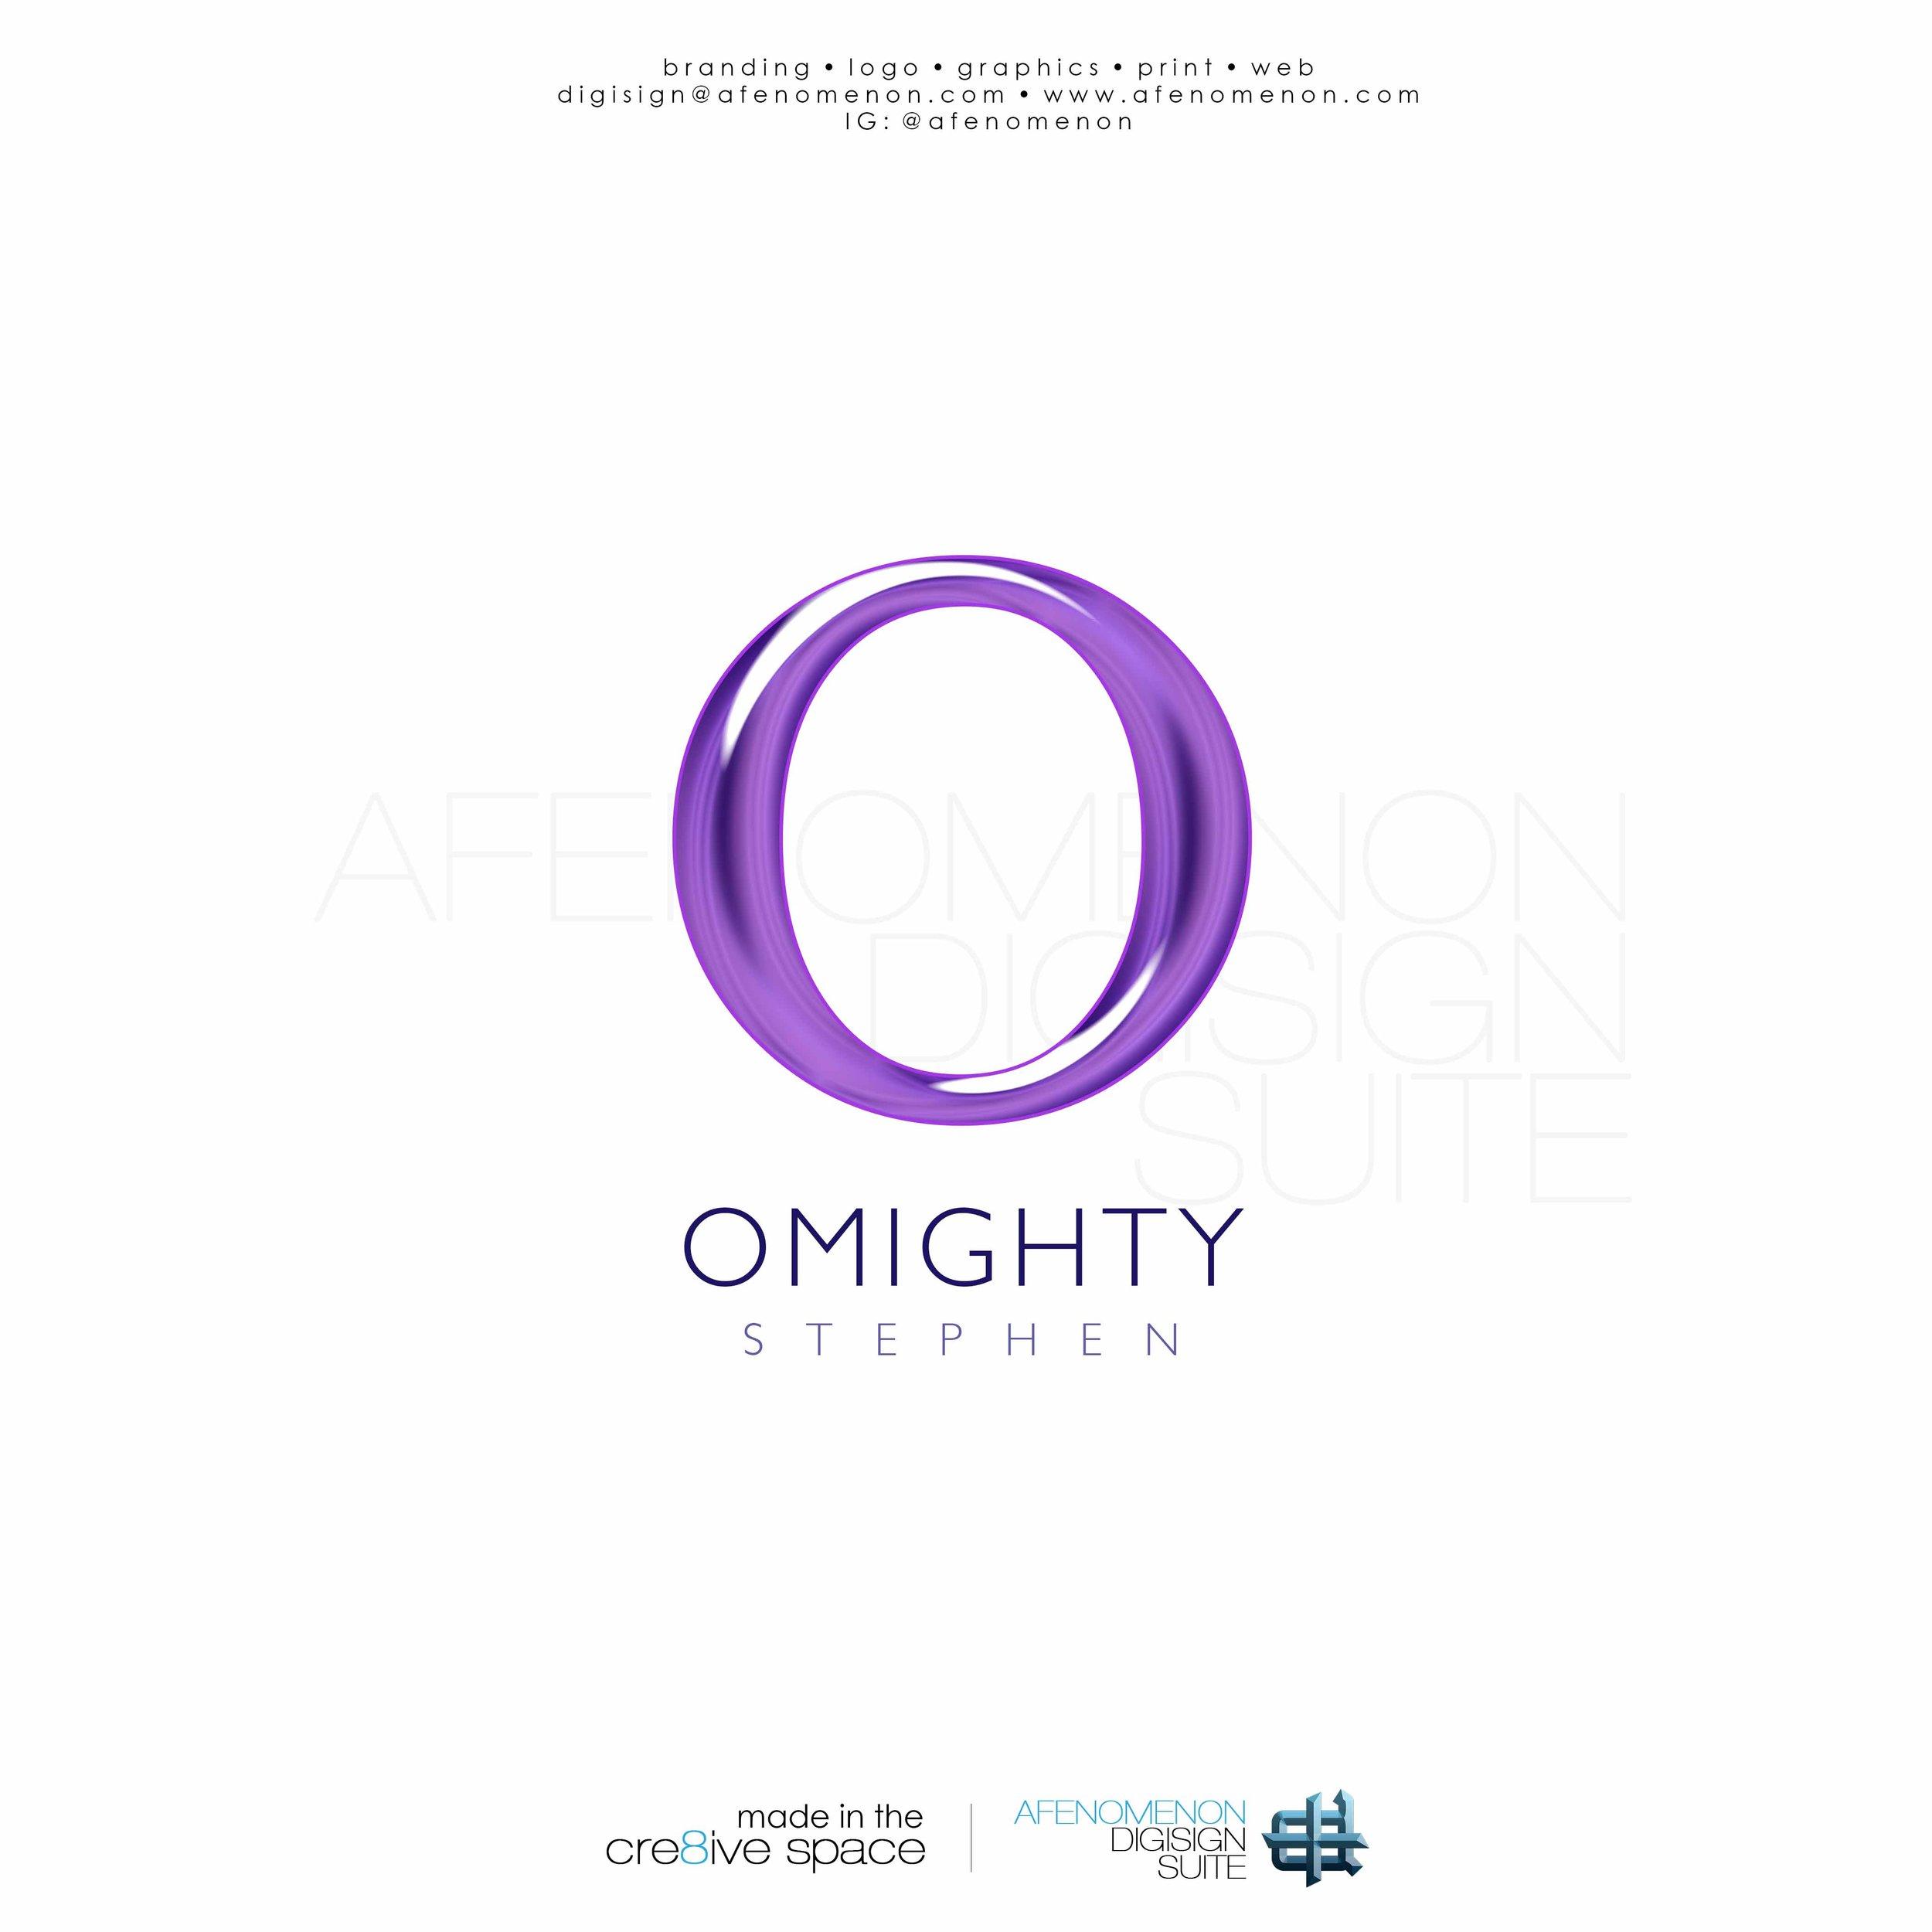 3 Omighty Stephen Logo.jpg